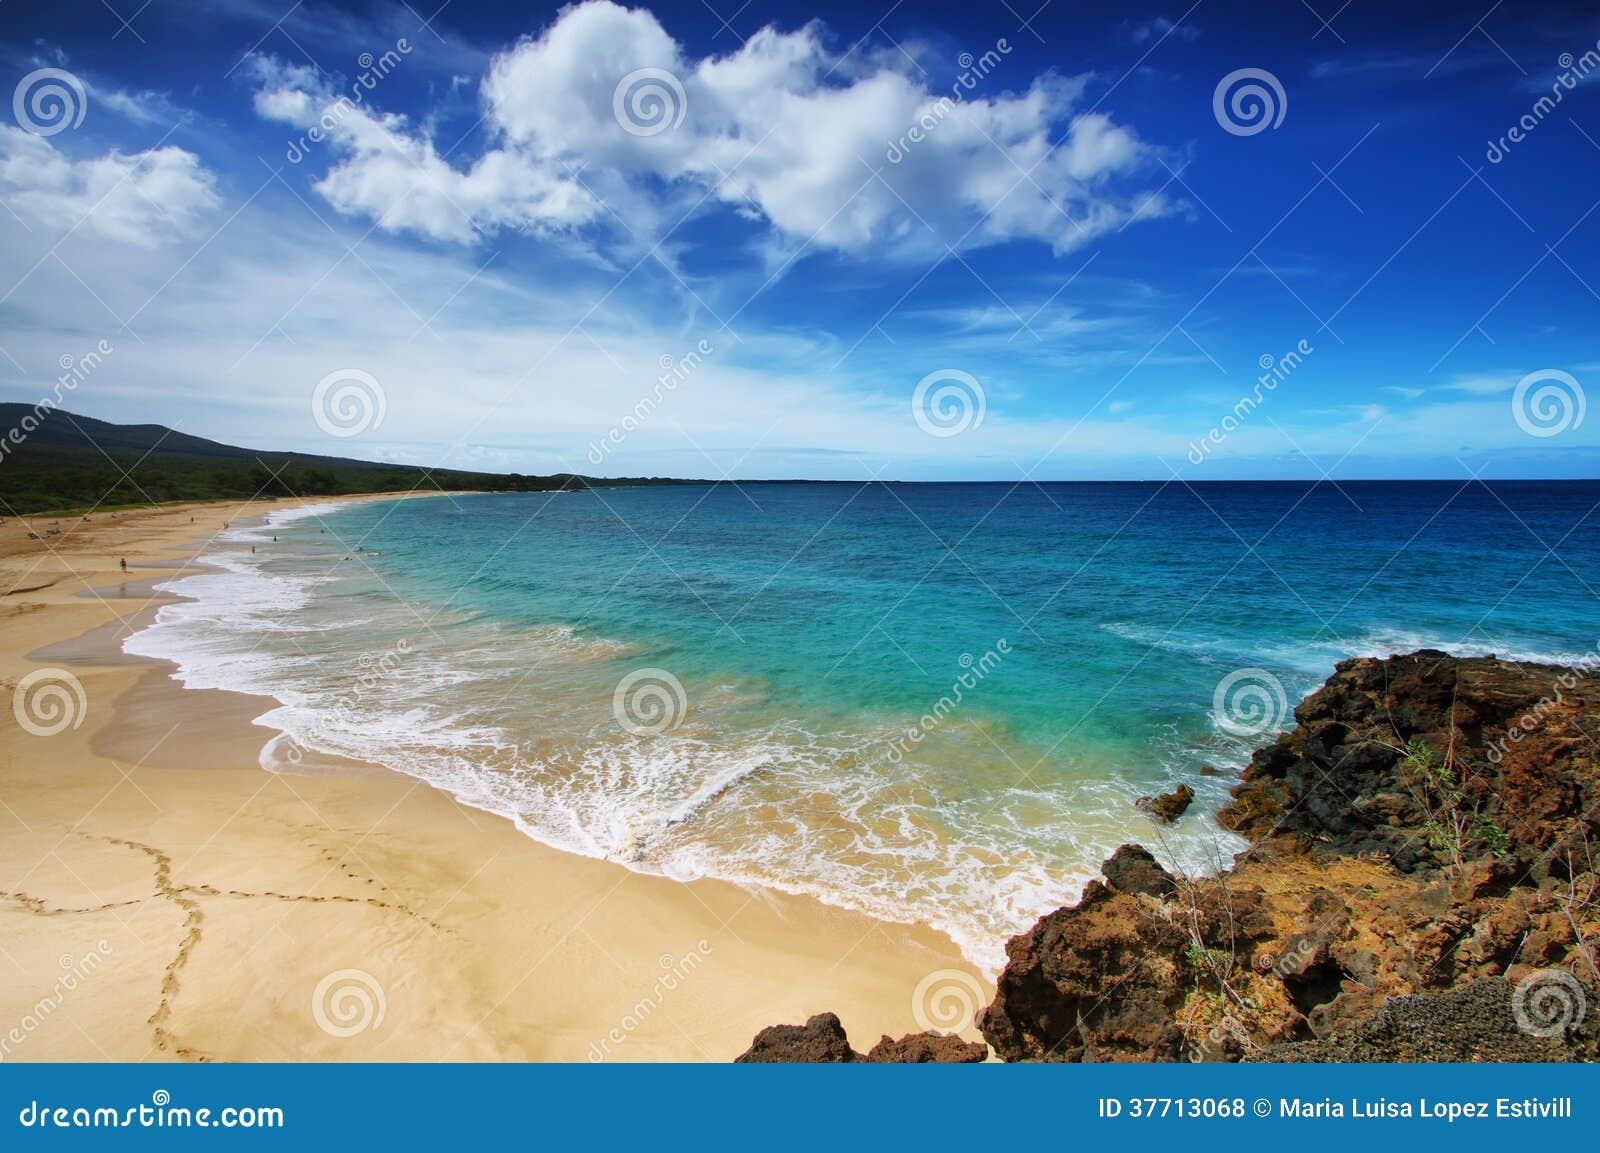 Makena Beach In Maui Hawaii Stock Photo Image Of Relax